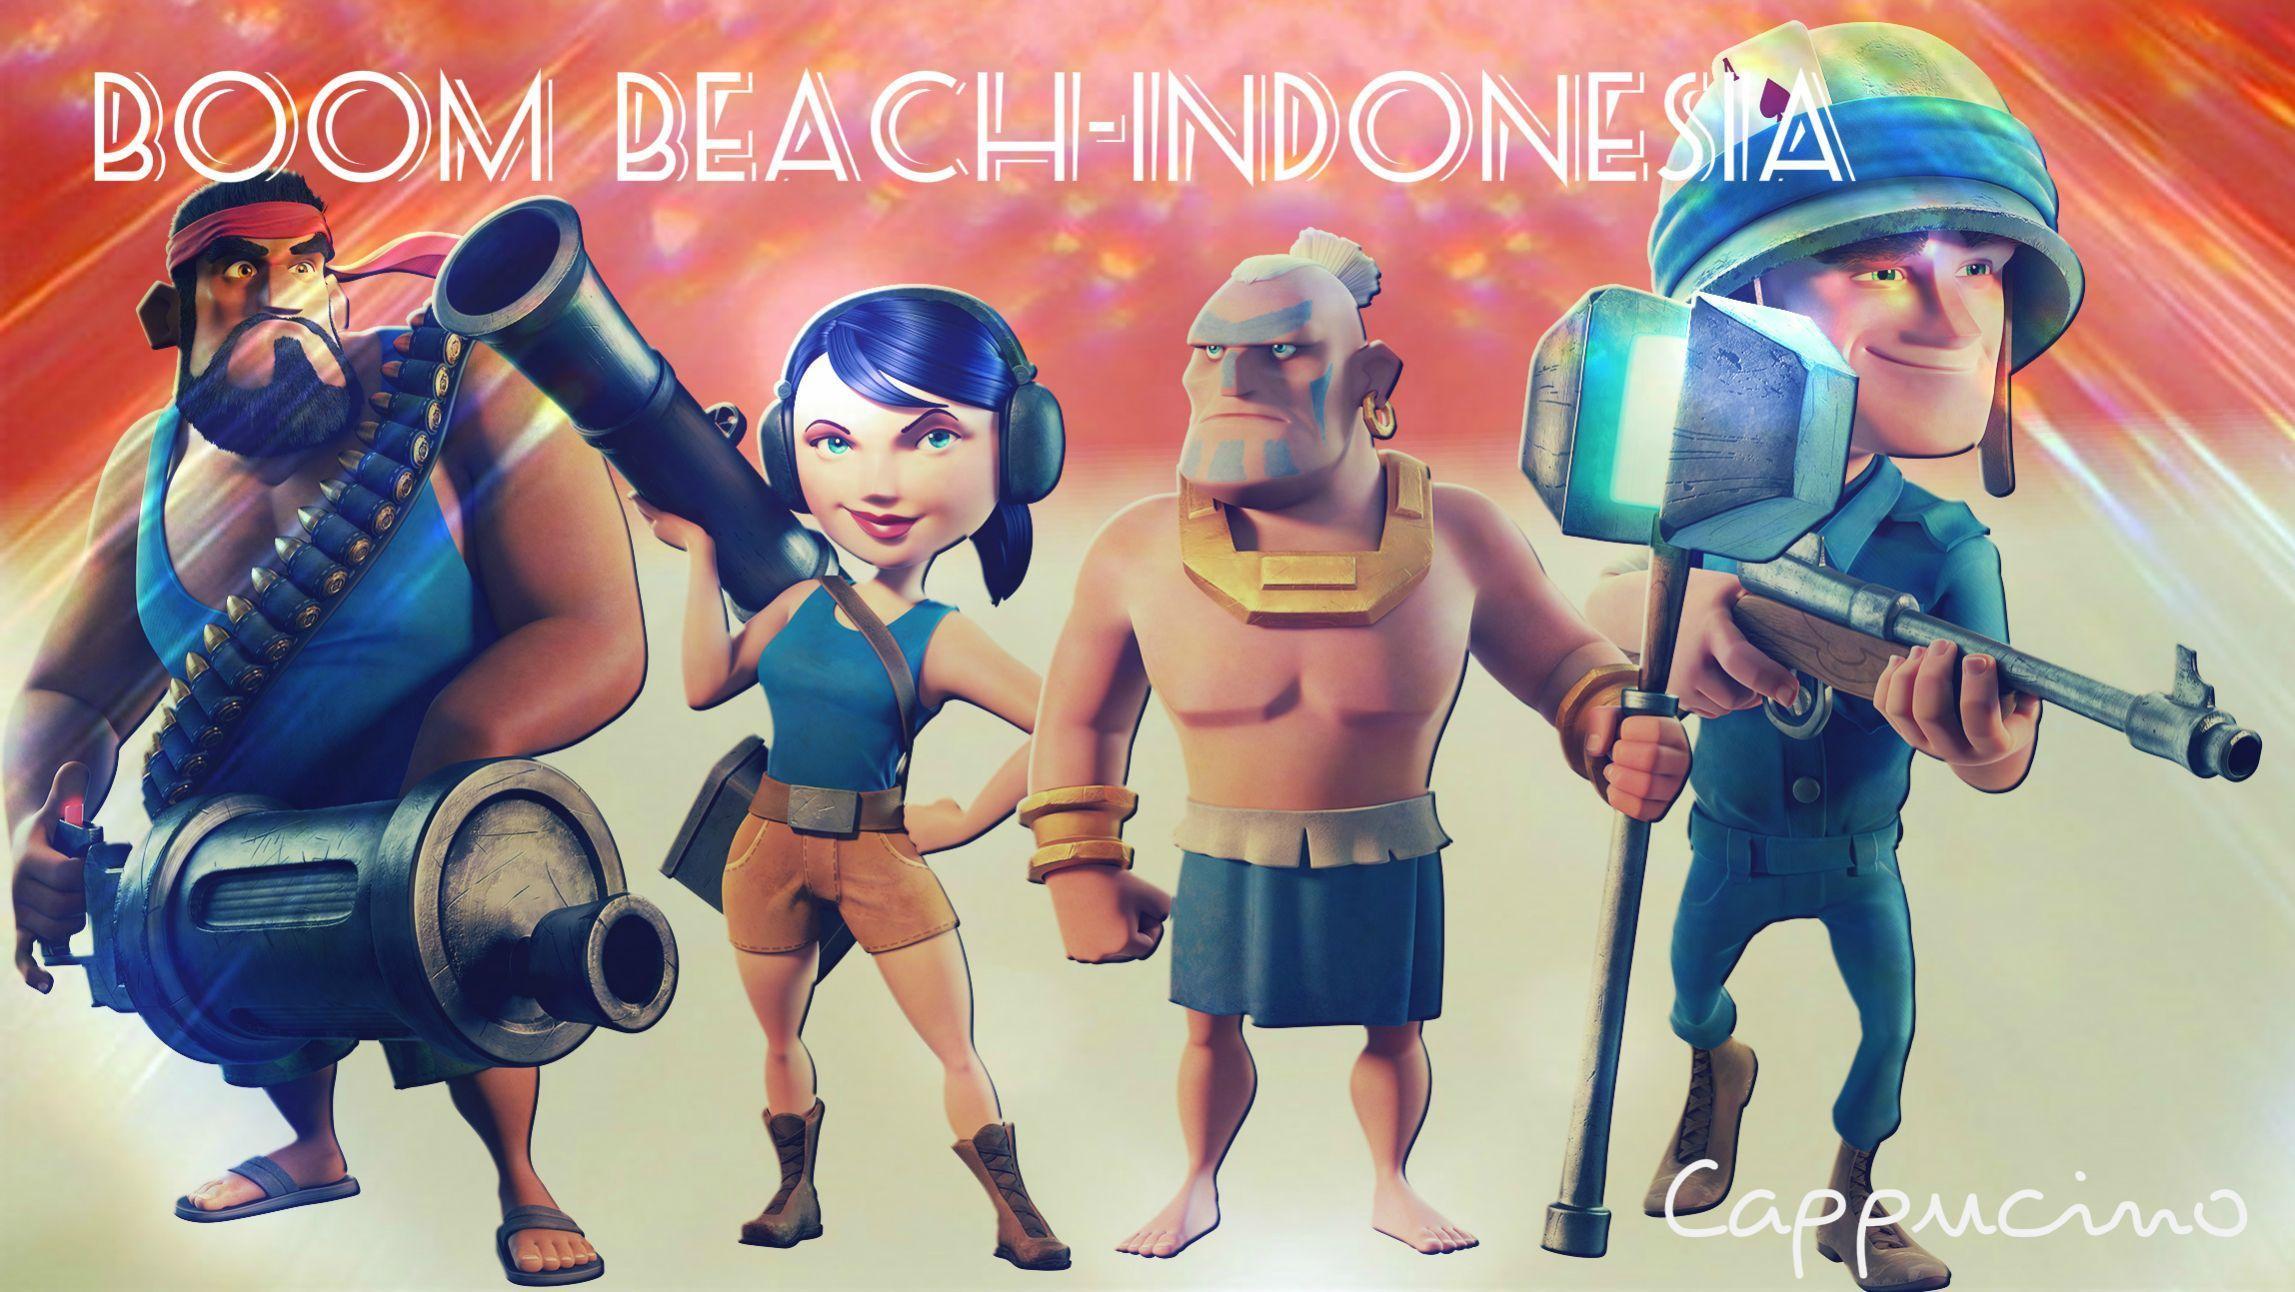 download boom beach wallpaper desktop z6r500 download page